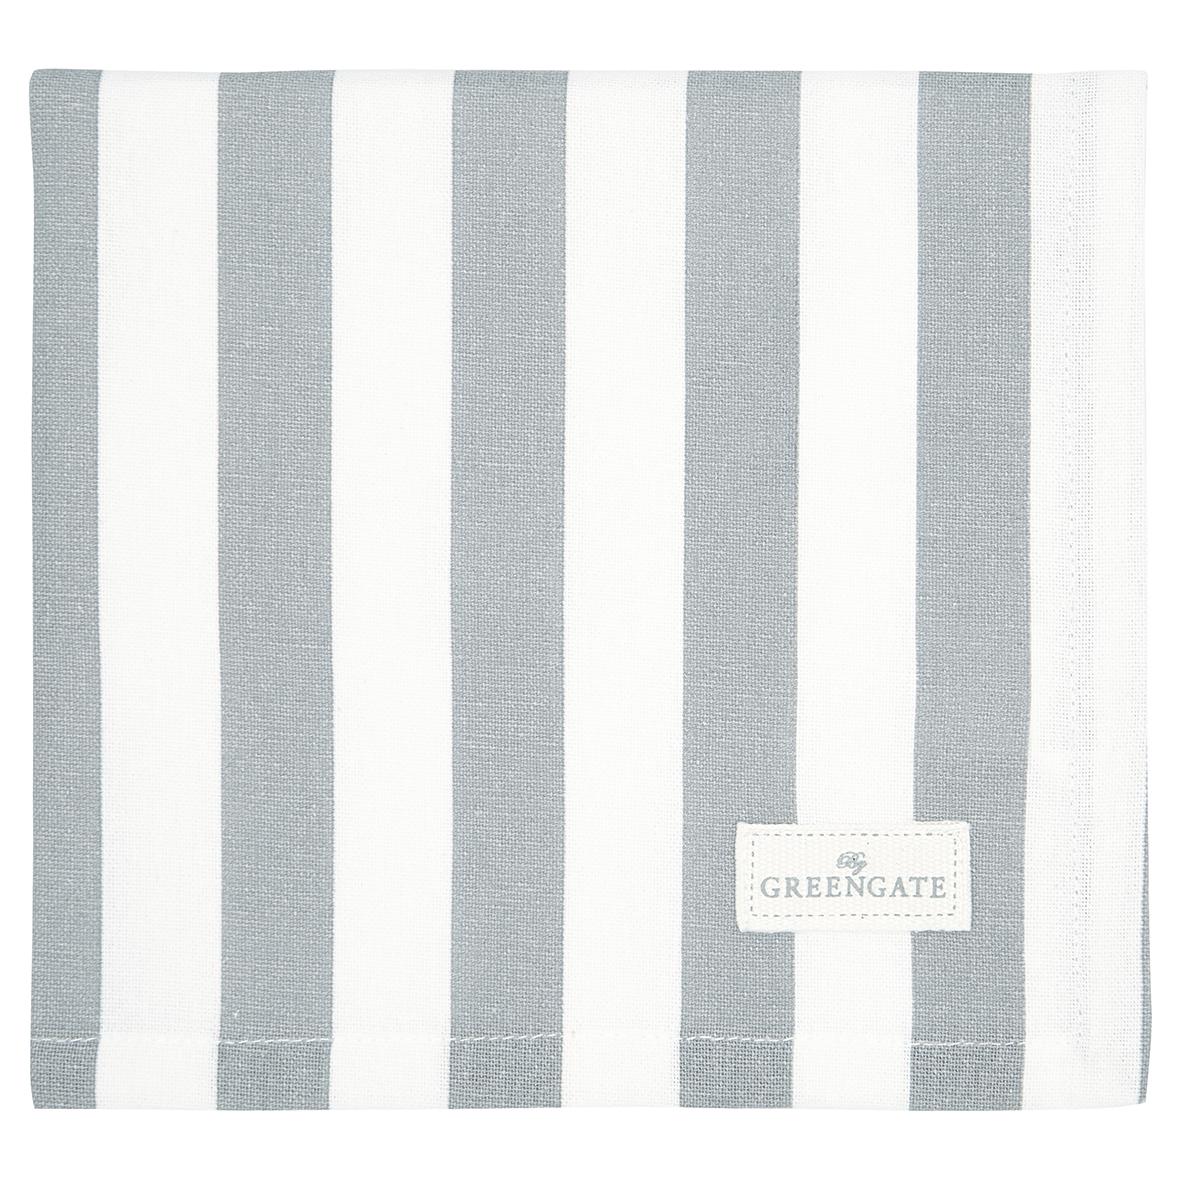 Greengate Stoffserviette Rigmor grey